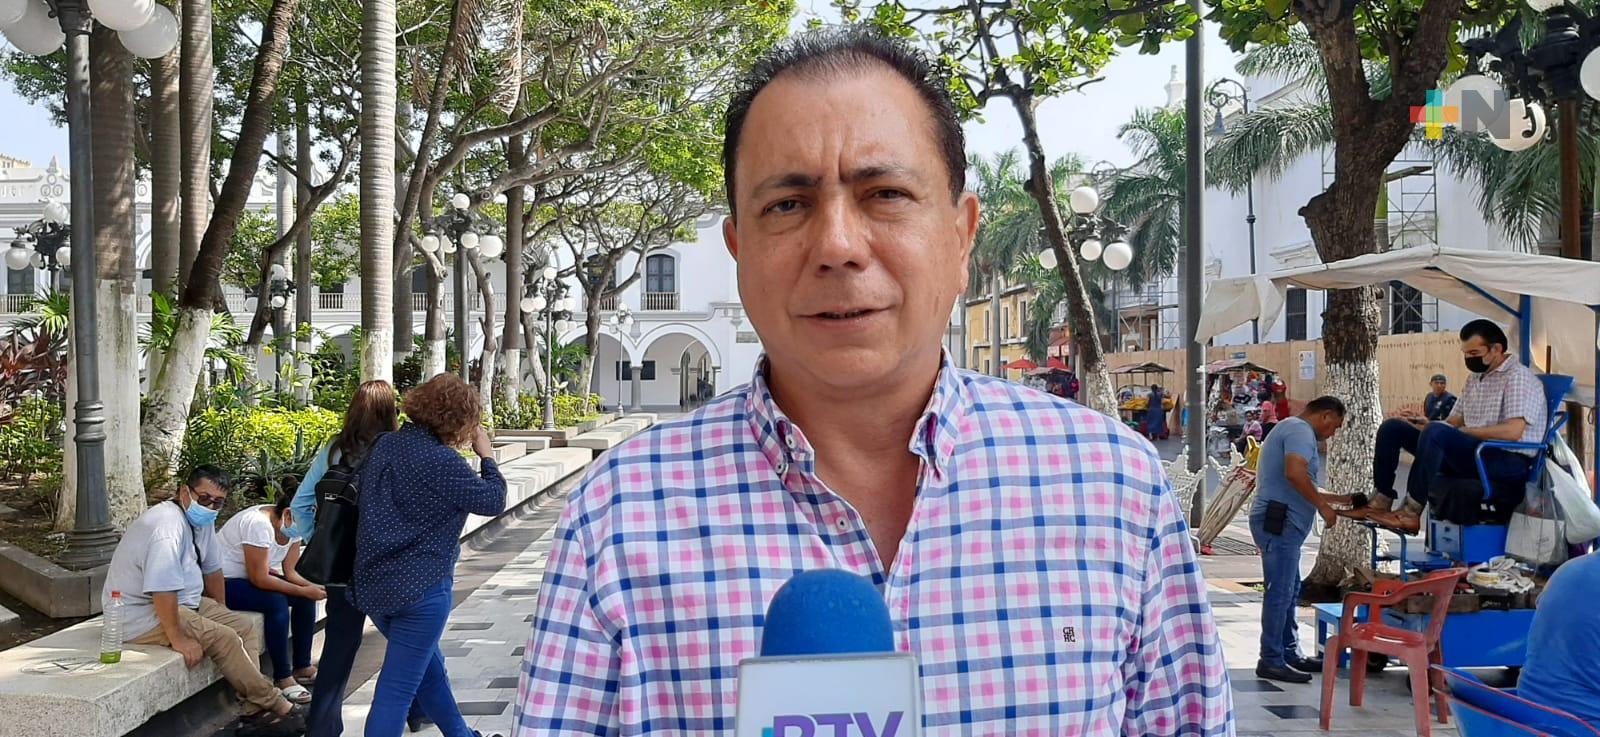 Dueña de restaurante adeuda un millón 200 mil pesos de rentas atrasadas